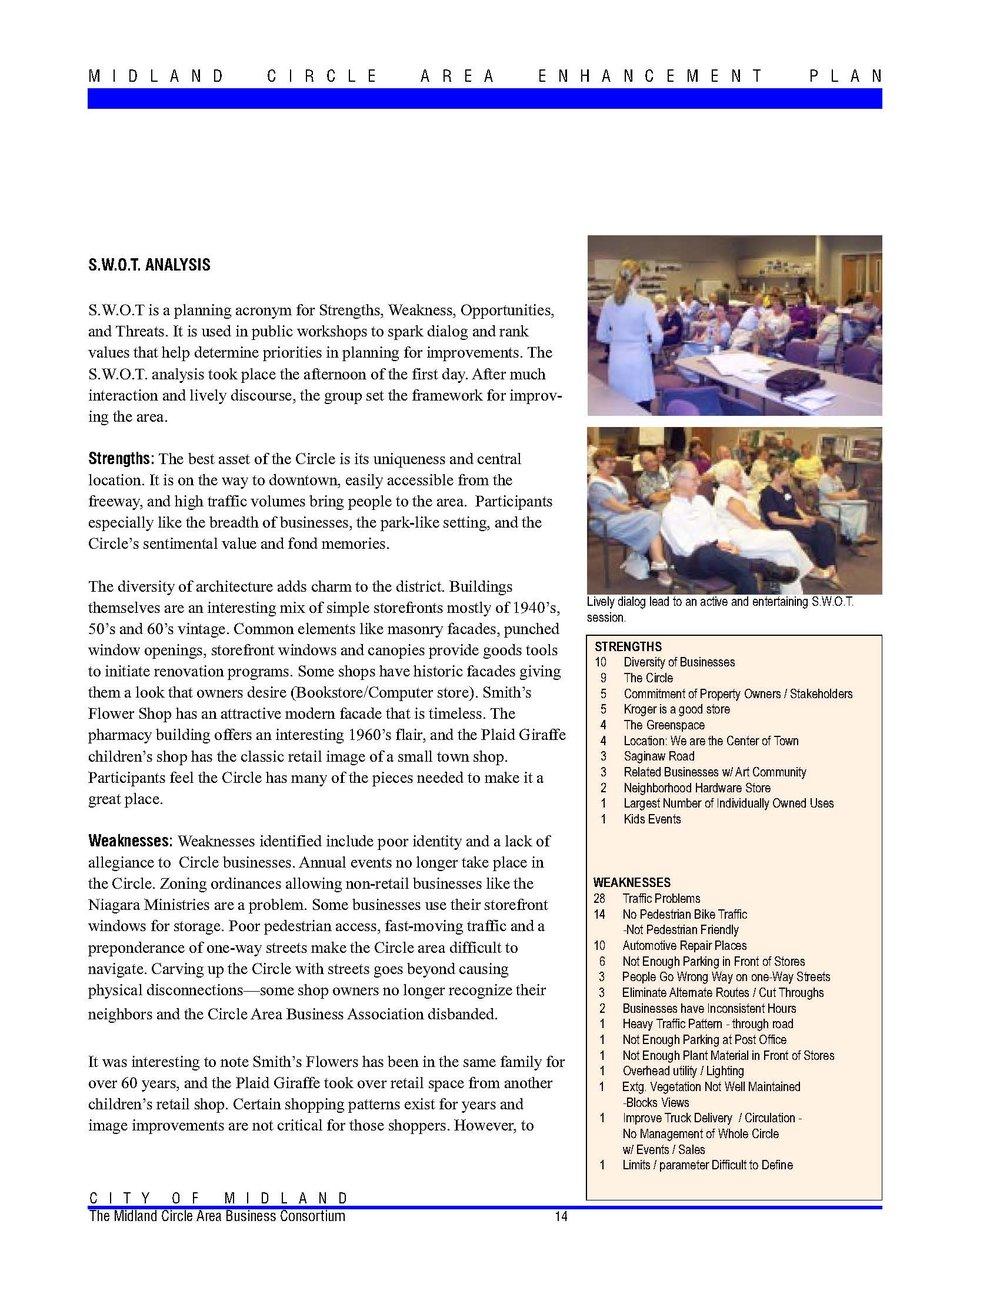 Ashman Circle Enhancement Plan_Page_16.jpg